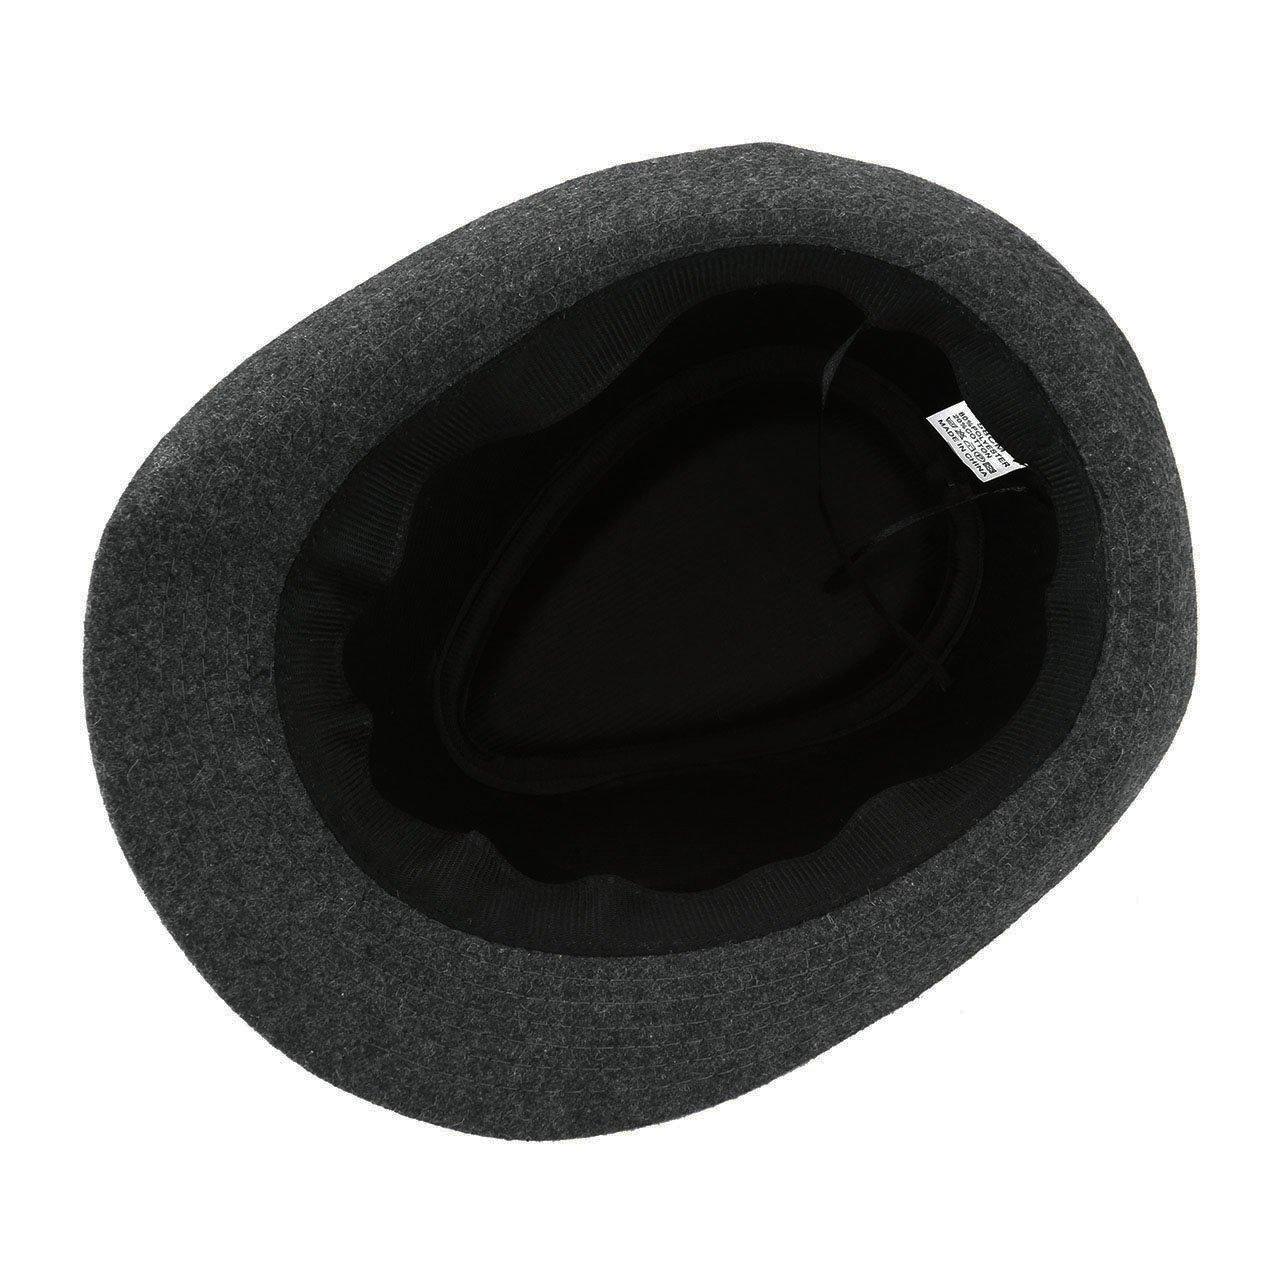 Unisex Classic Manhattan Fedora Hat Black Band Fashion Casual Jazz Wool Cap (Grey) by Faleto (Image #4)